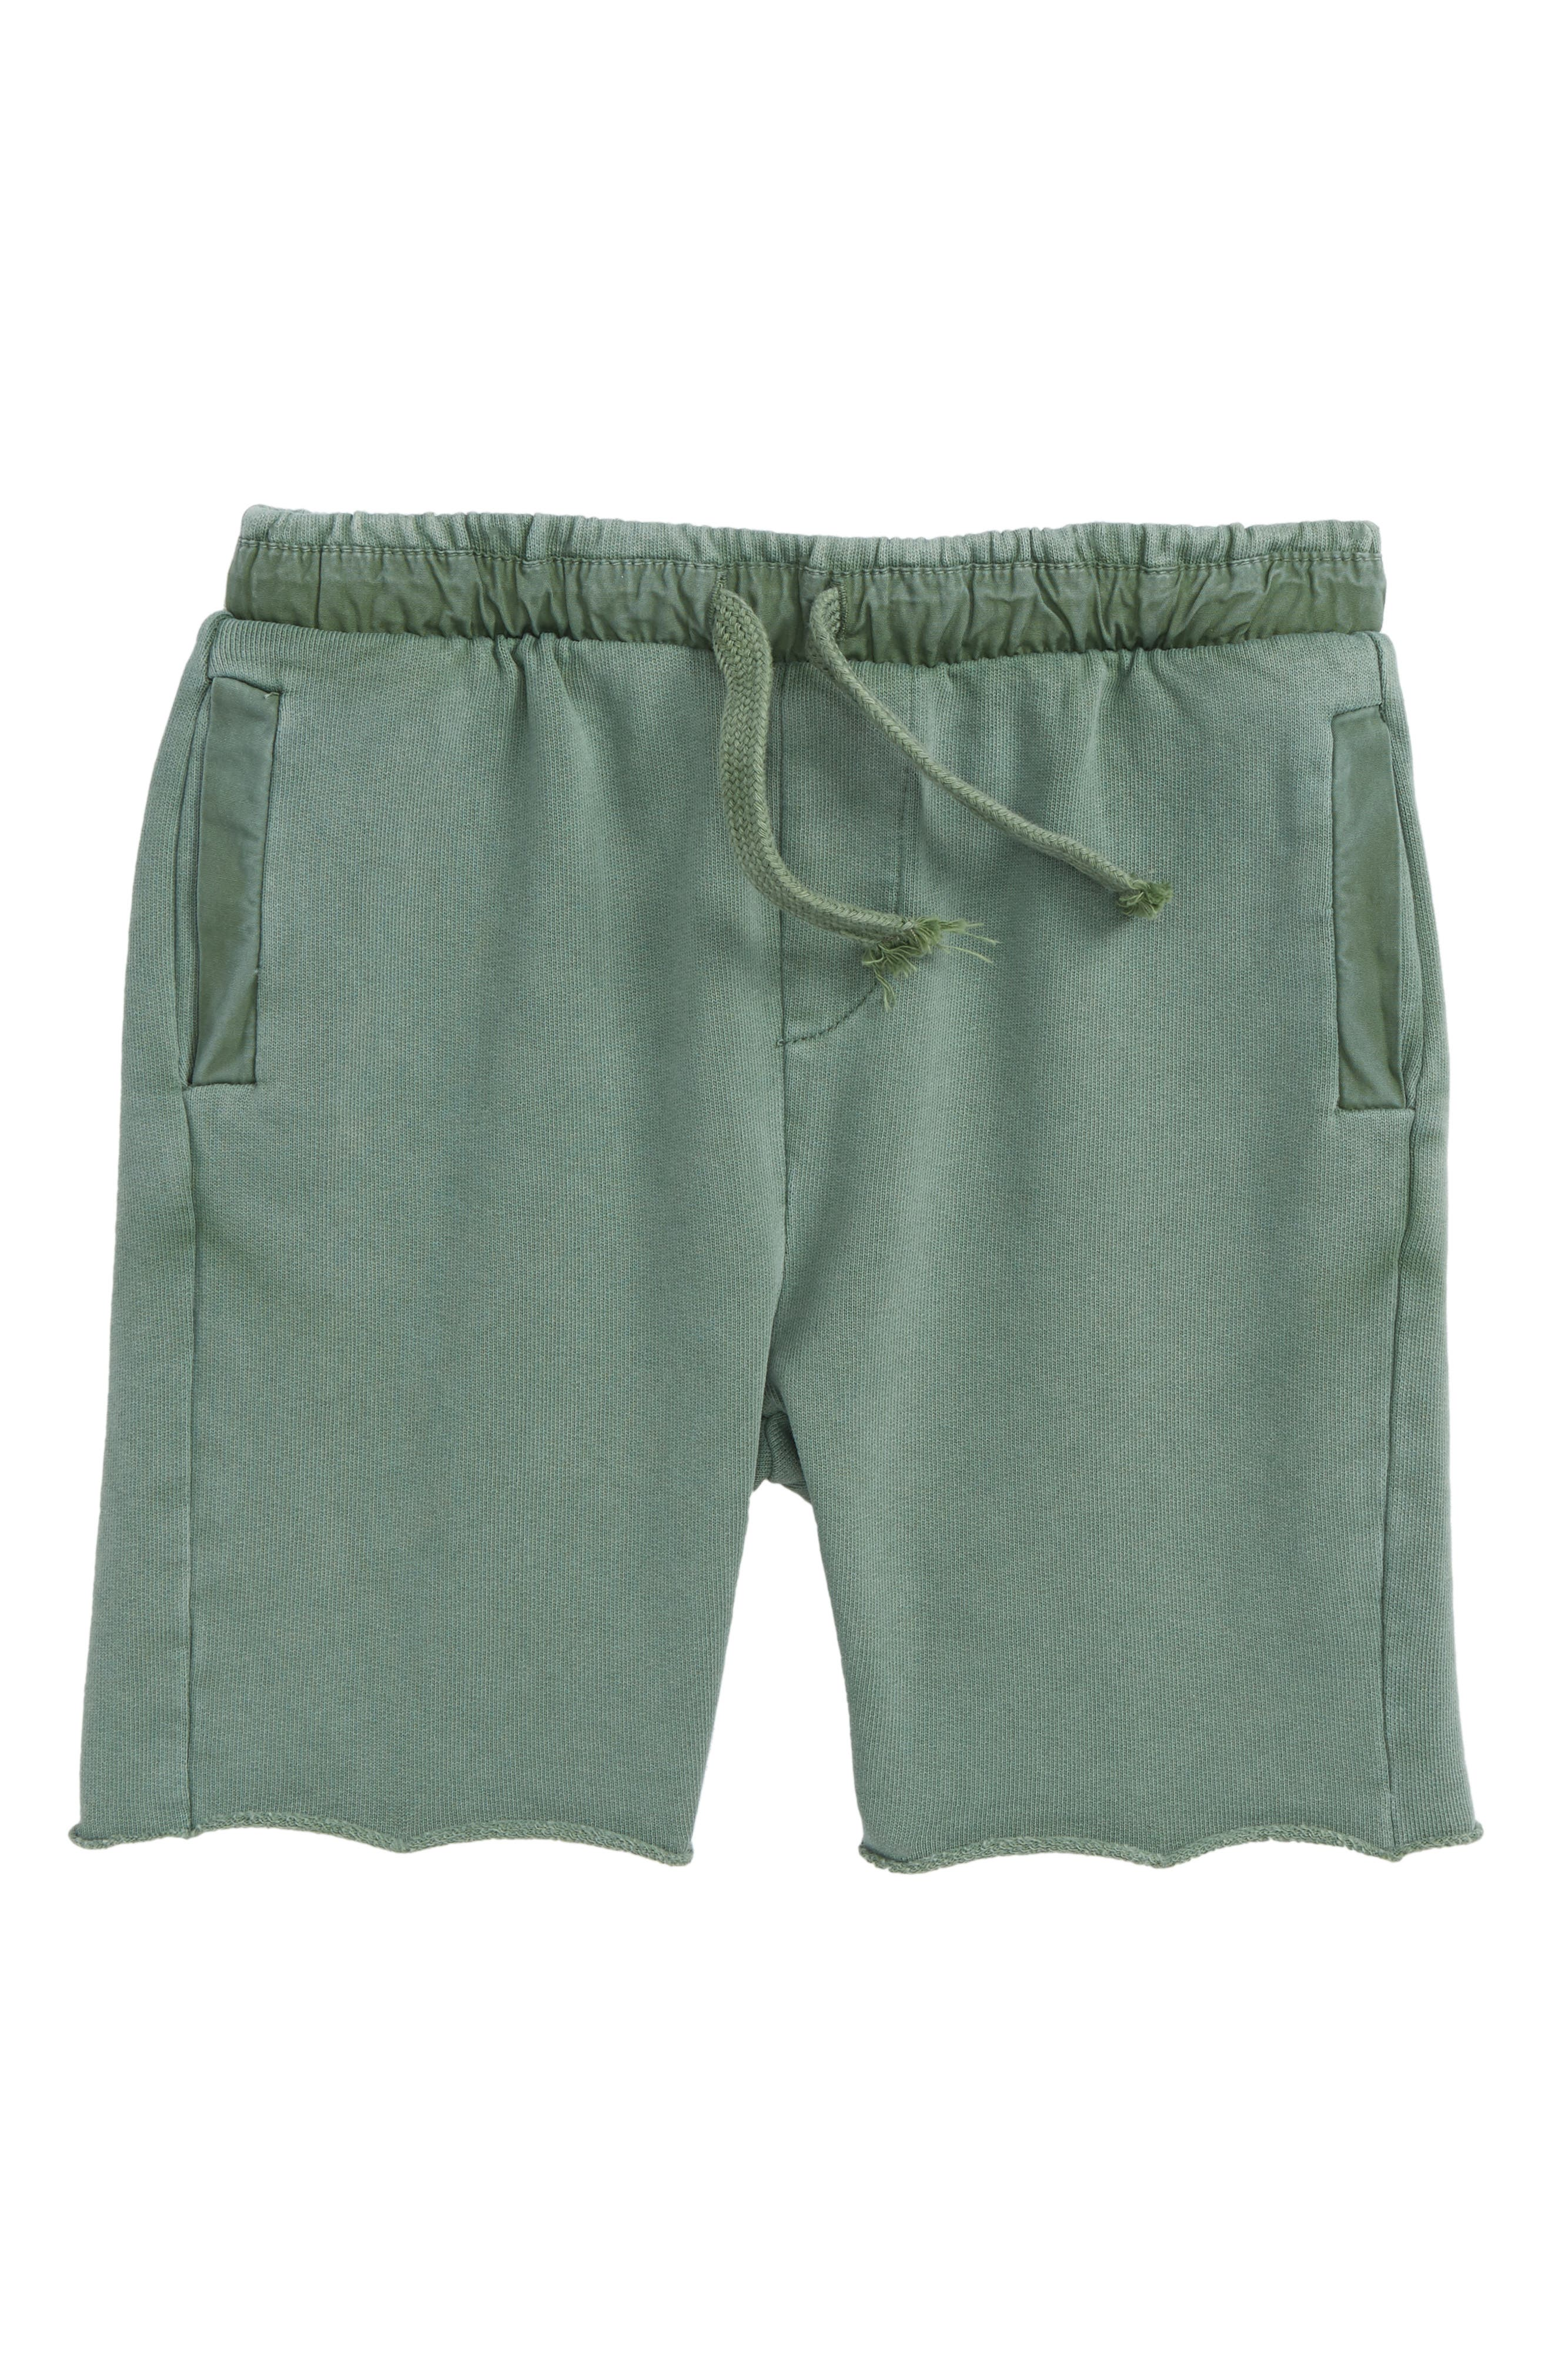 Kids Cullen Organic Cotton Shorts,                         Main,                         color, 370